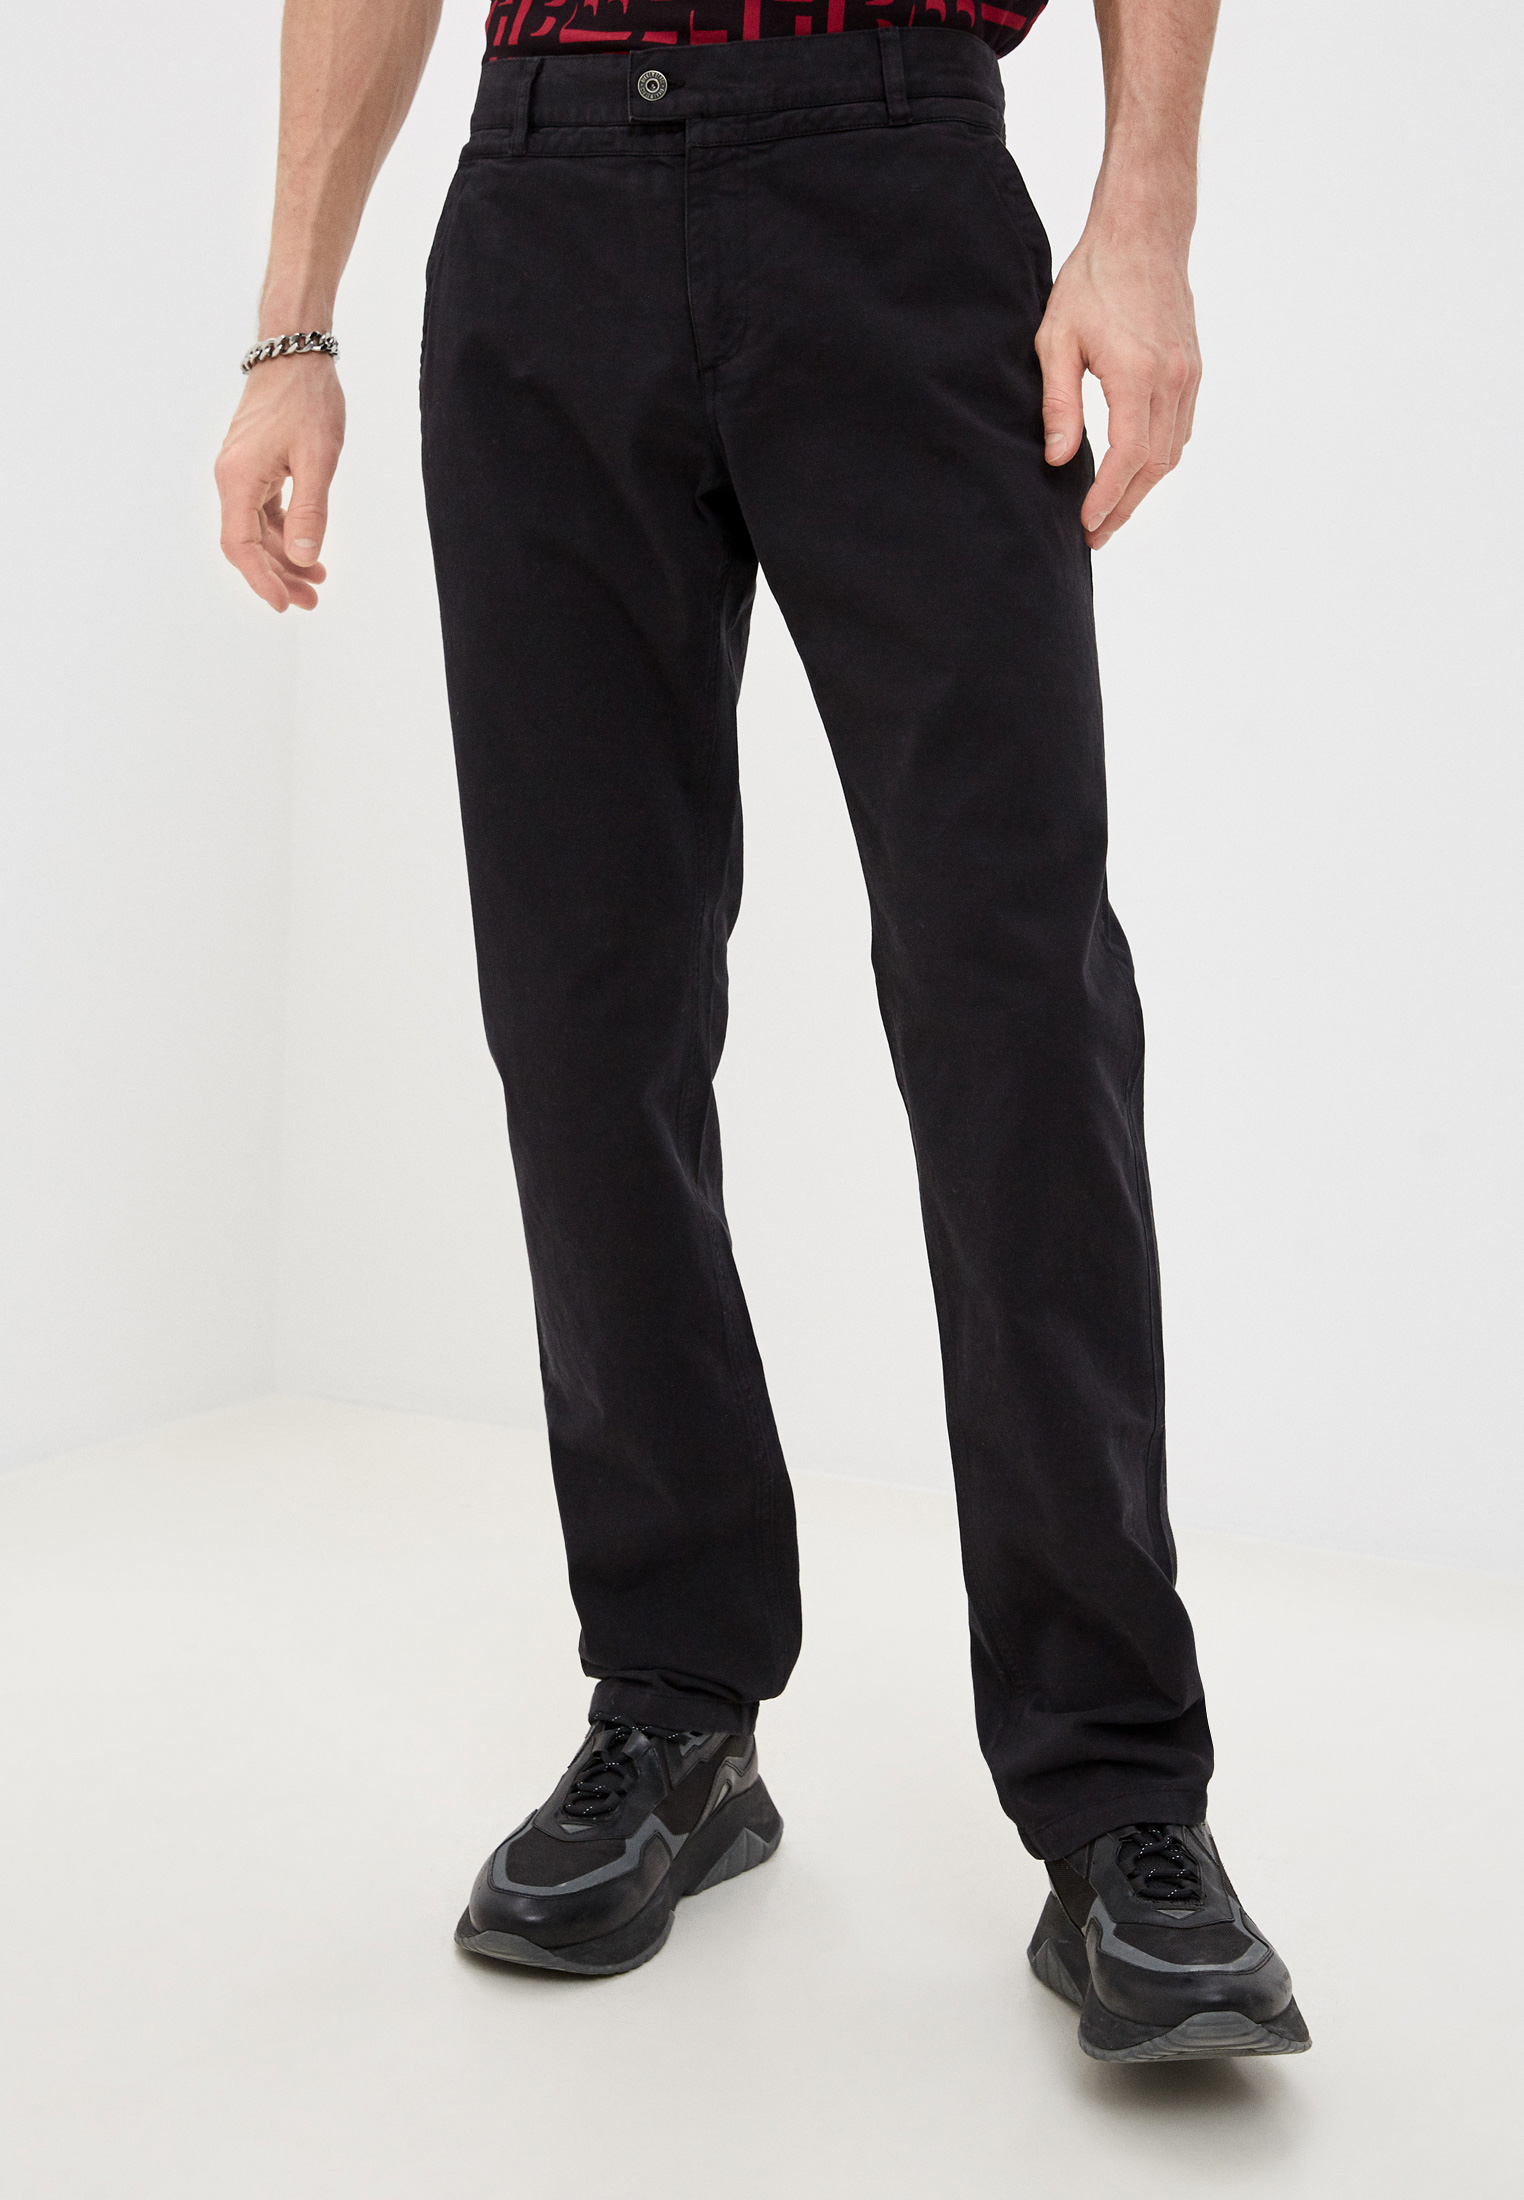 Мужские повседневные брюки Bikkembergs (Биккембергс) C P 112 00 S 3279